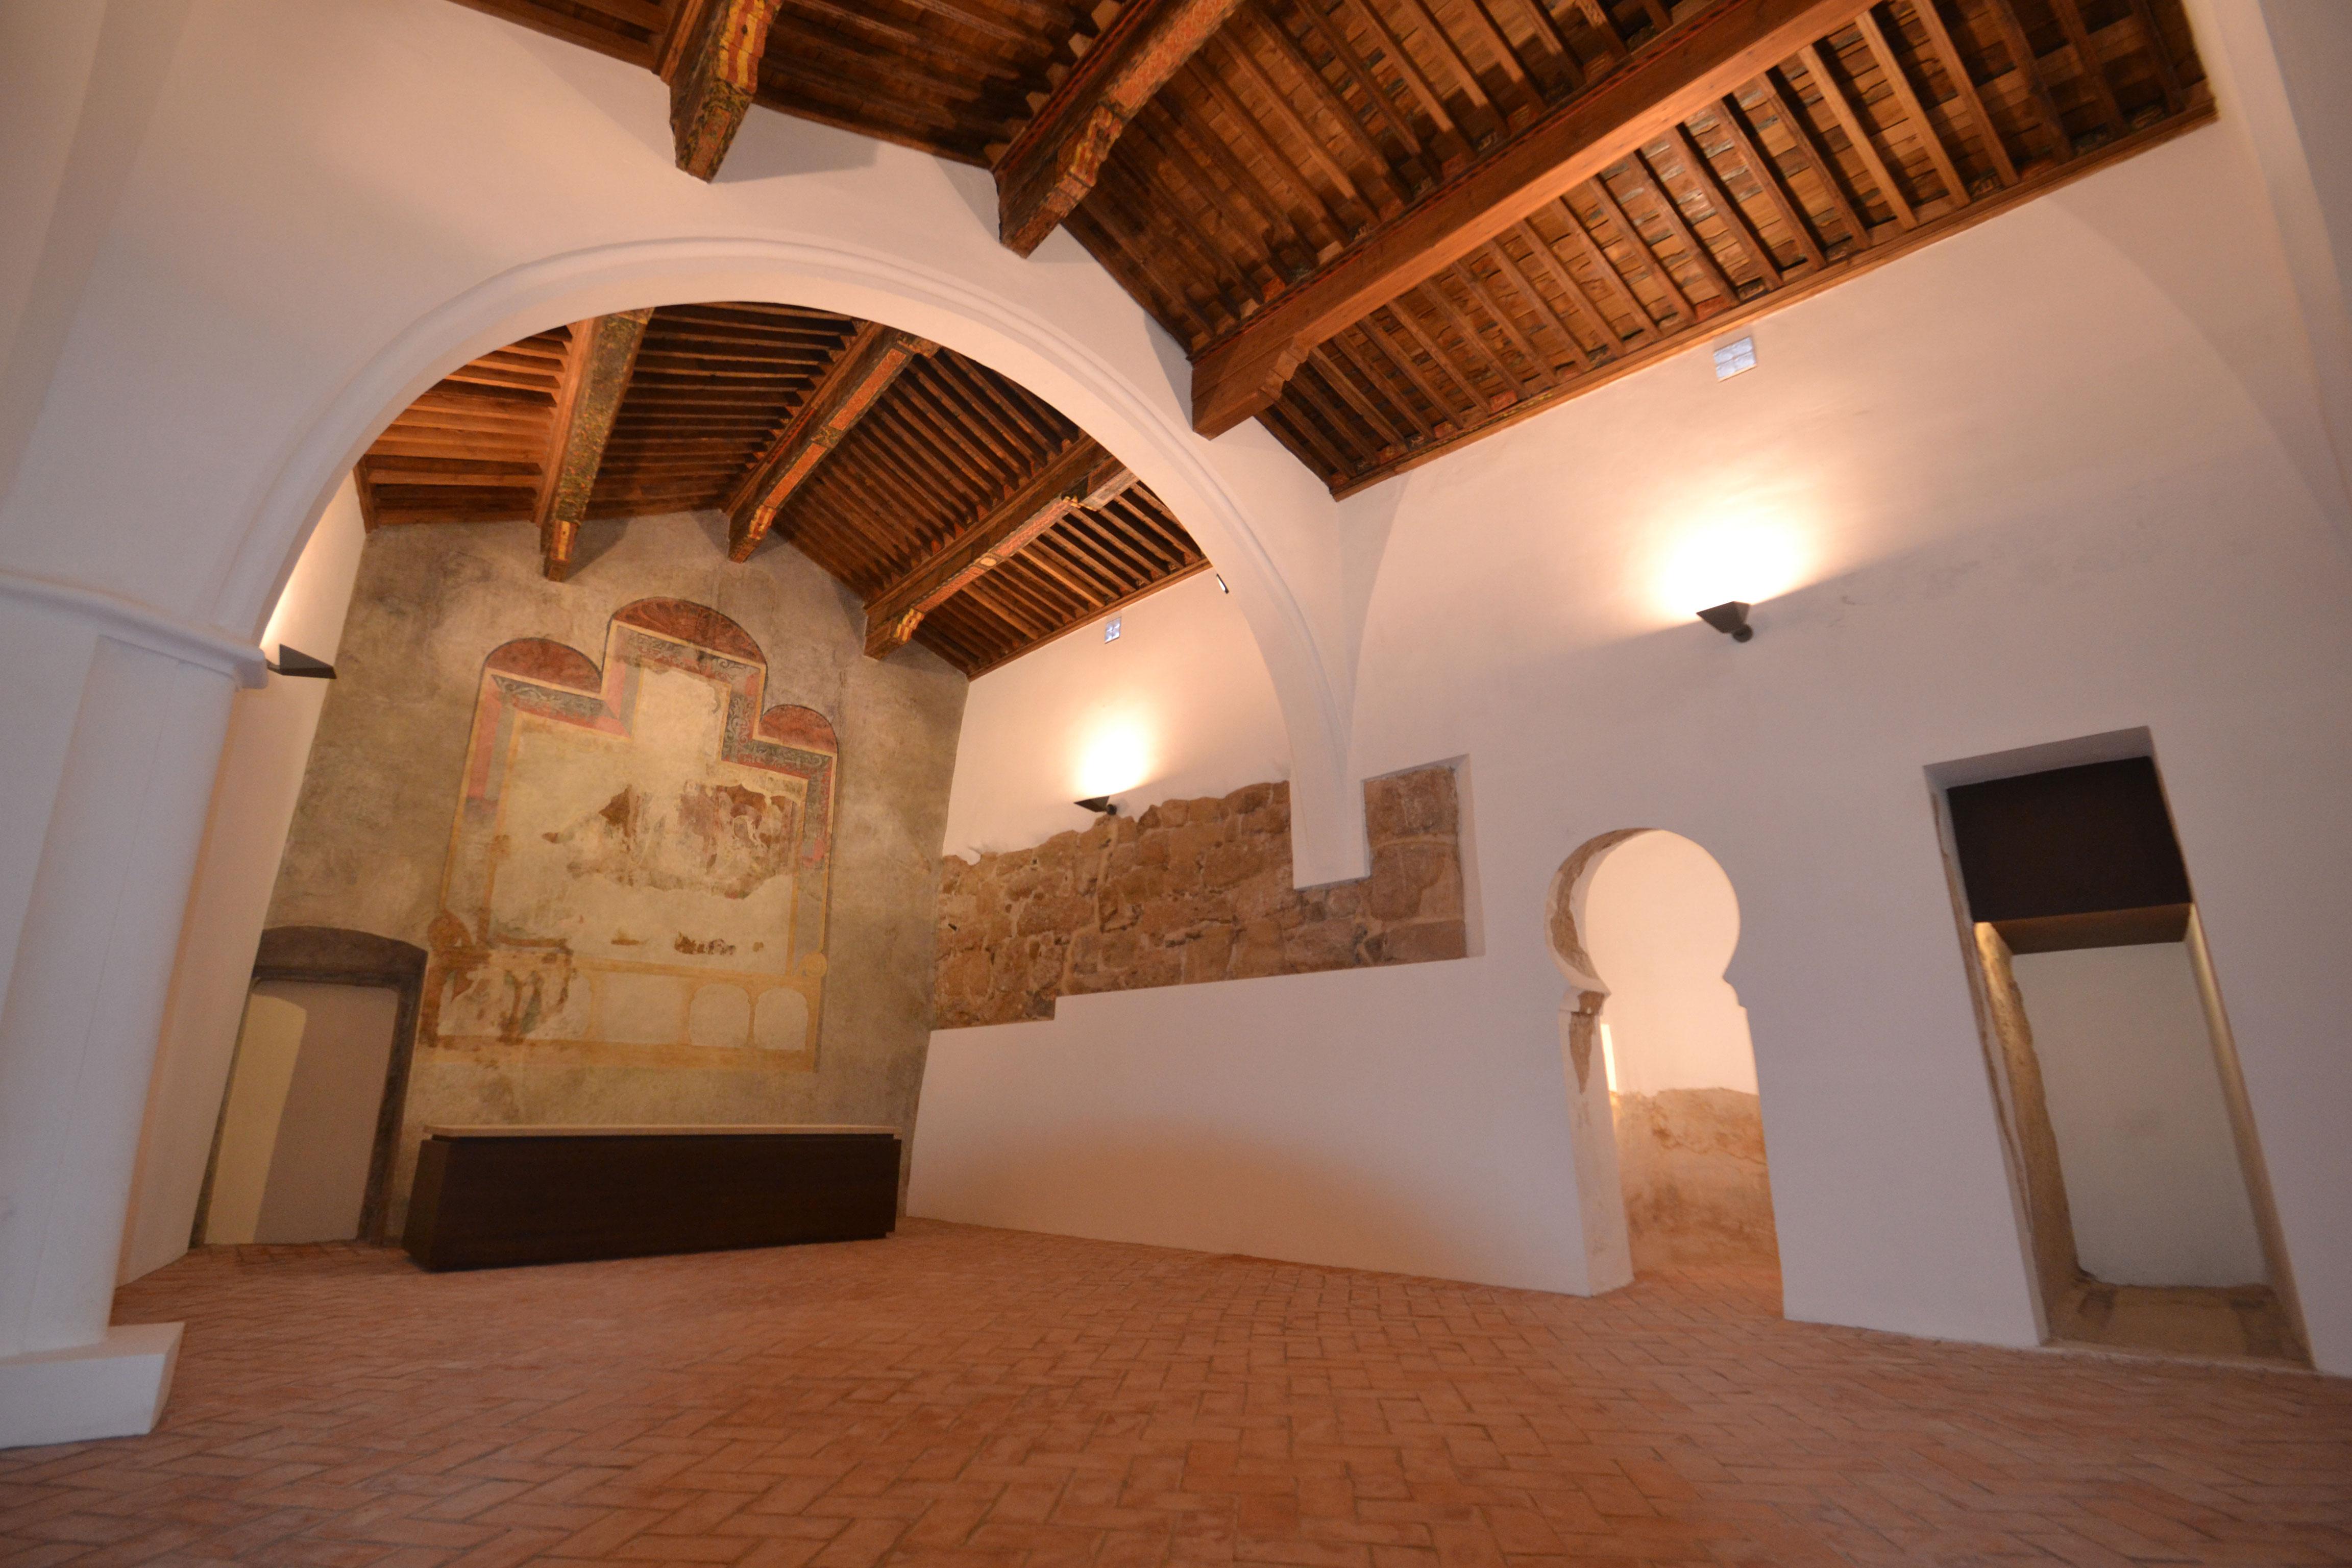 Turismo ayuntamiento de tarazona for Oficina turismo tarazona